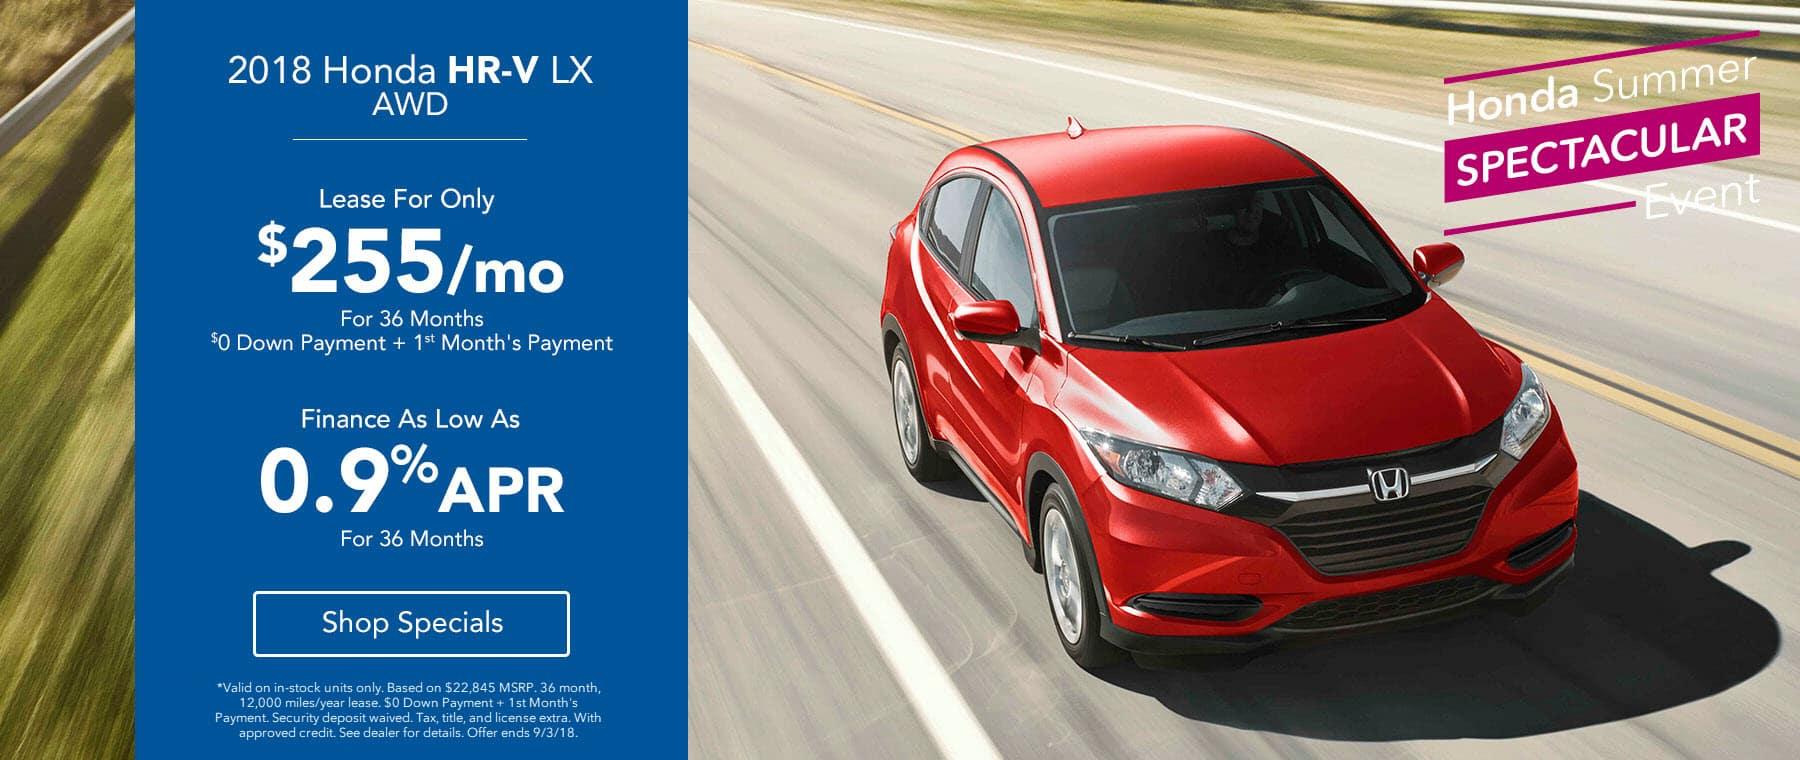 2018 Honda HR-V LX AWD - Lease for $255/mo